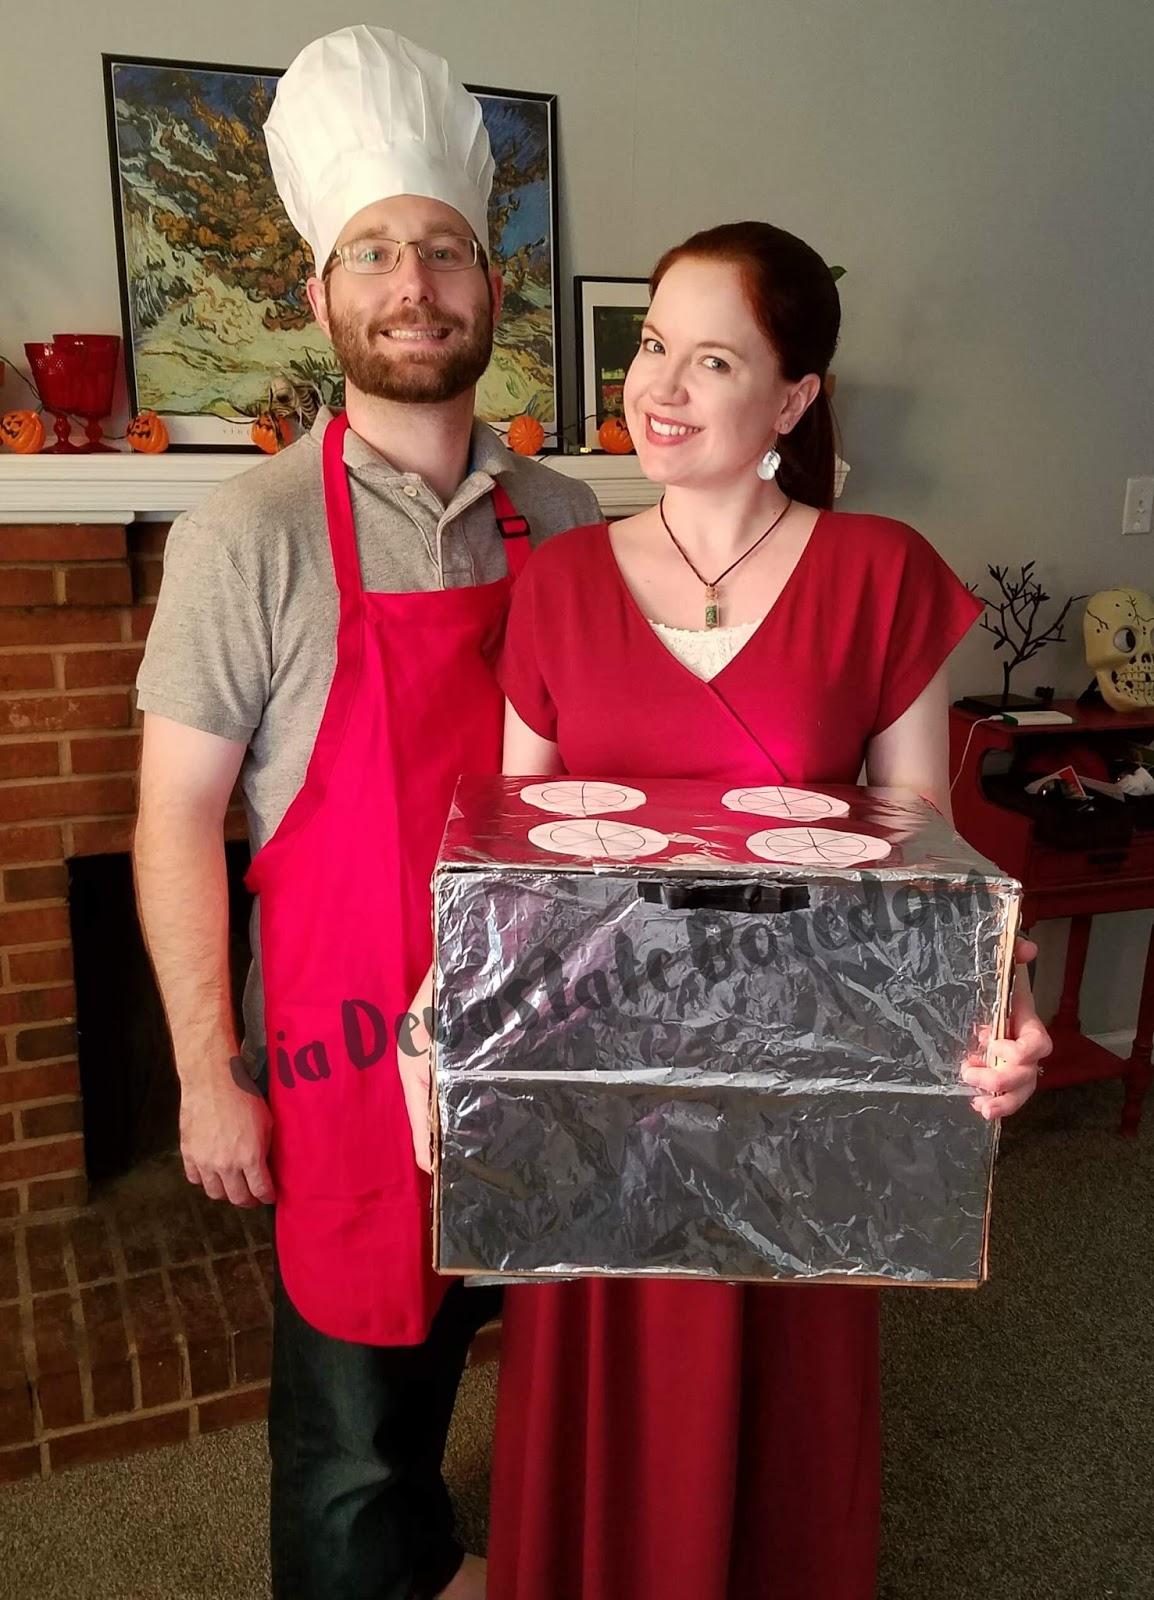 FridayFrivolity Pregnancy Announcement Edition Devastate – Bun in the Oven Baby Announcement